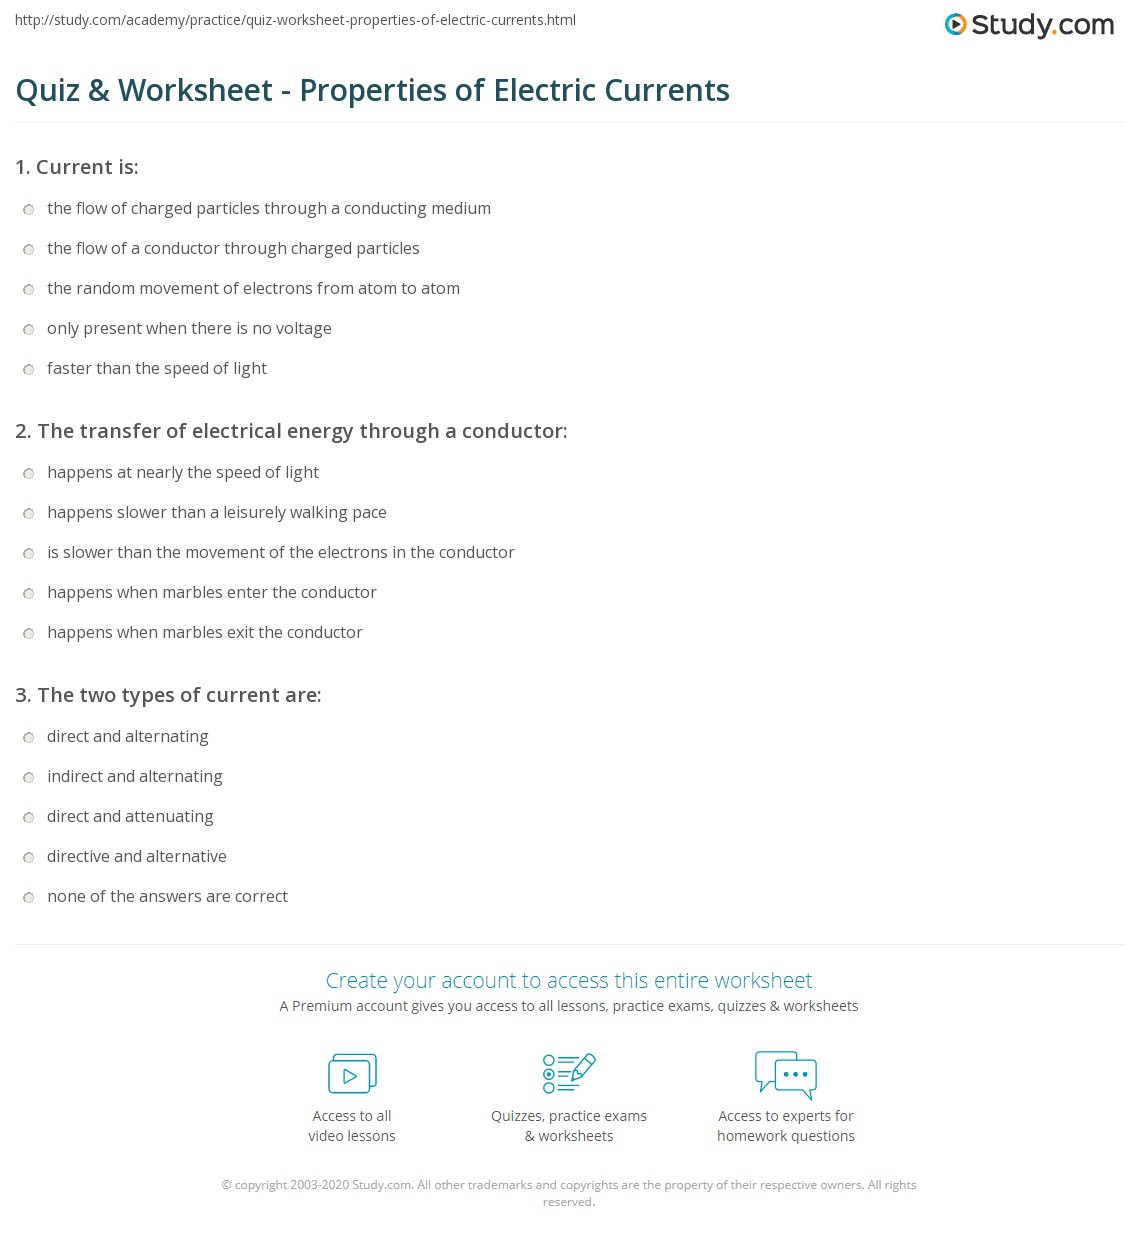 quiz & worksheet - properties of electric currents   study